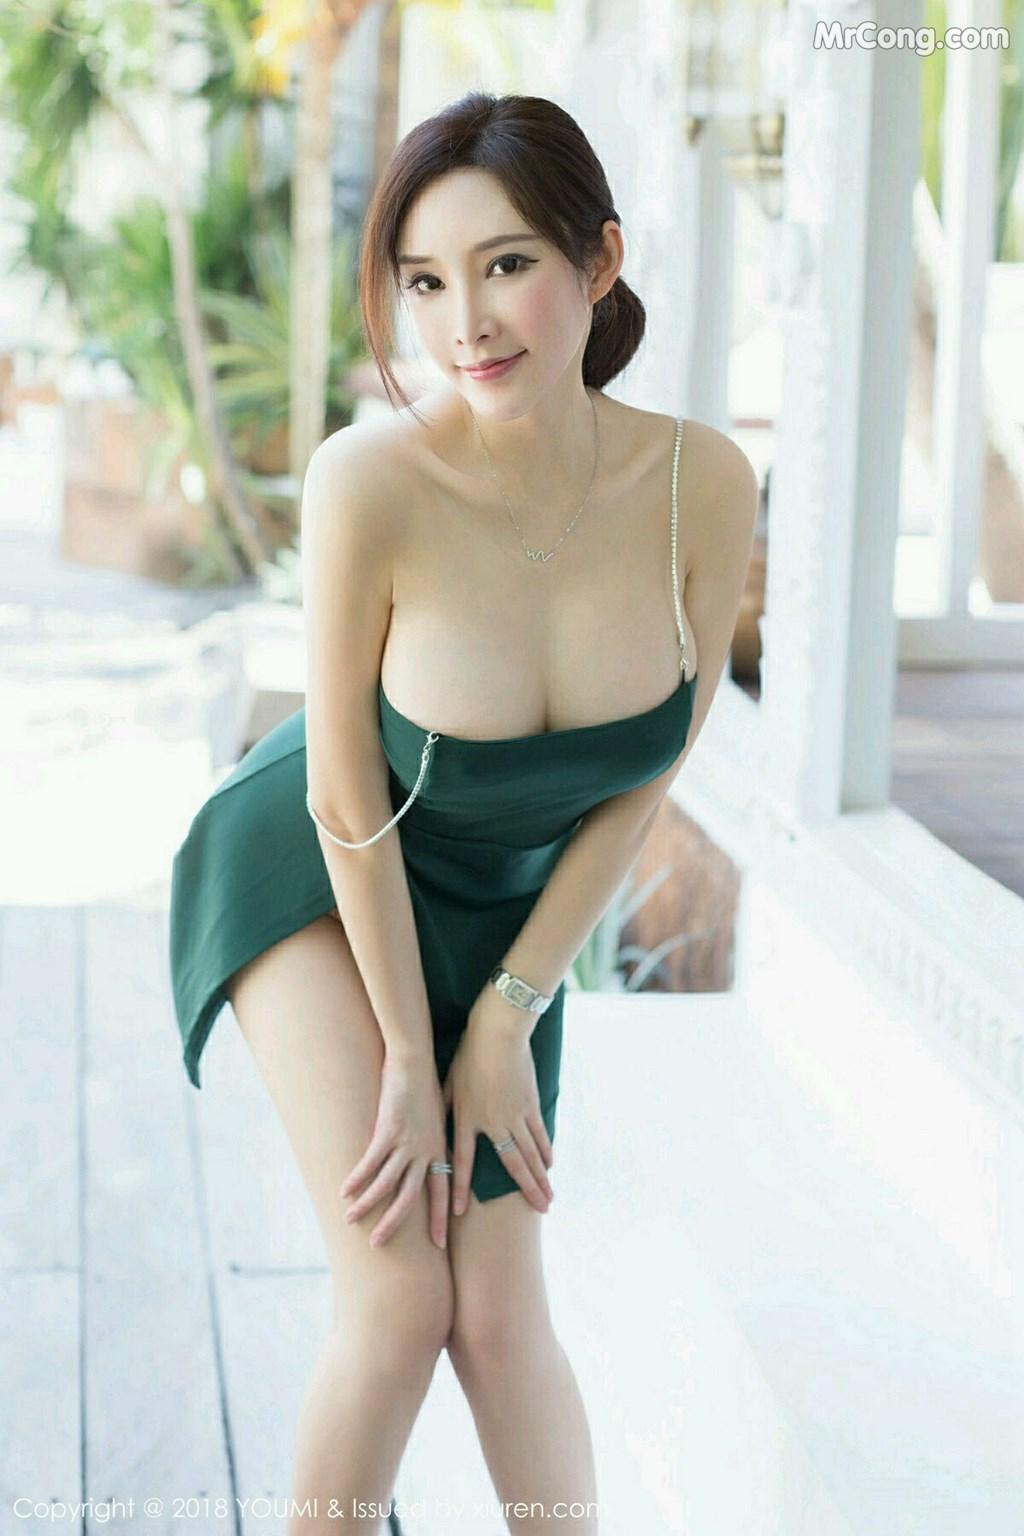 Image YouMi-Vol.188-Tu-Fei-Yuan-Ai-Cuo-Qiong-MrCong.com-010 in post YouMi Vol.188: Người mẫu 奶瓶土肥圆 (52 ảnh)